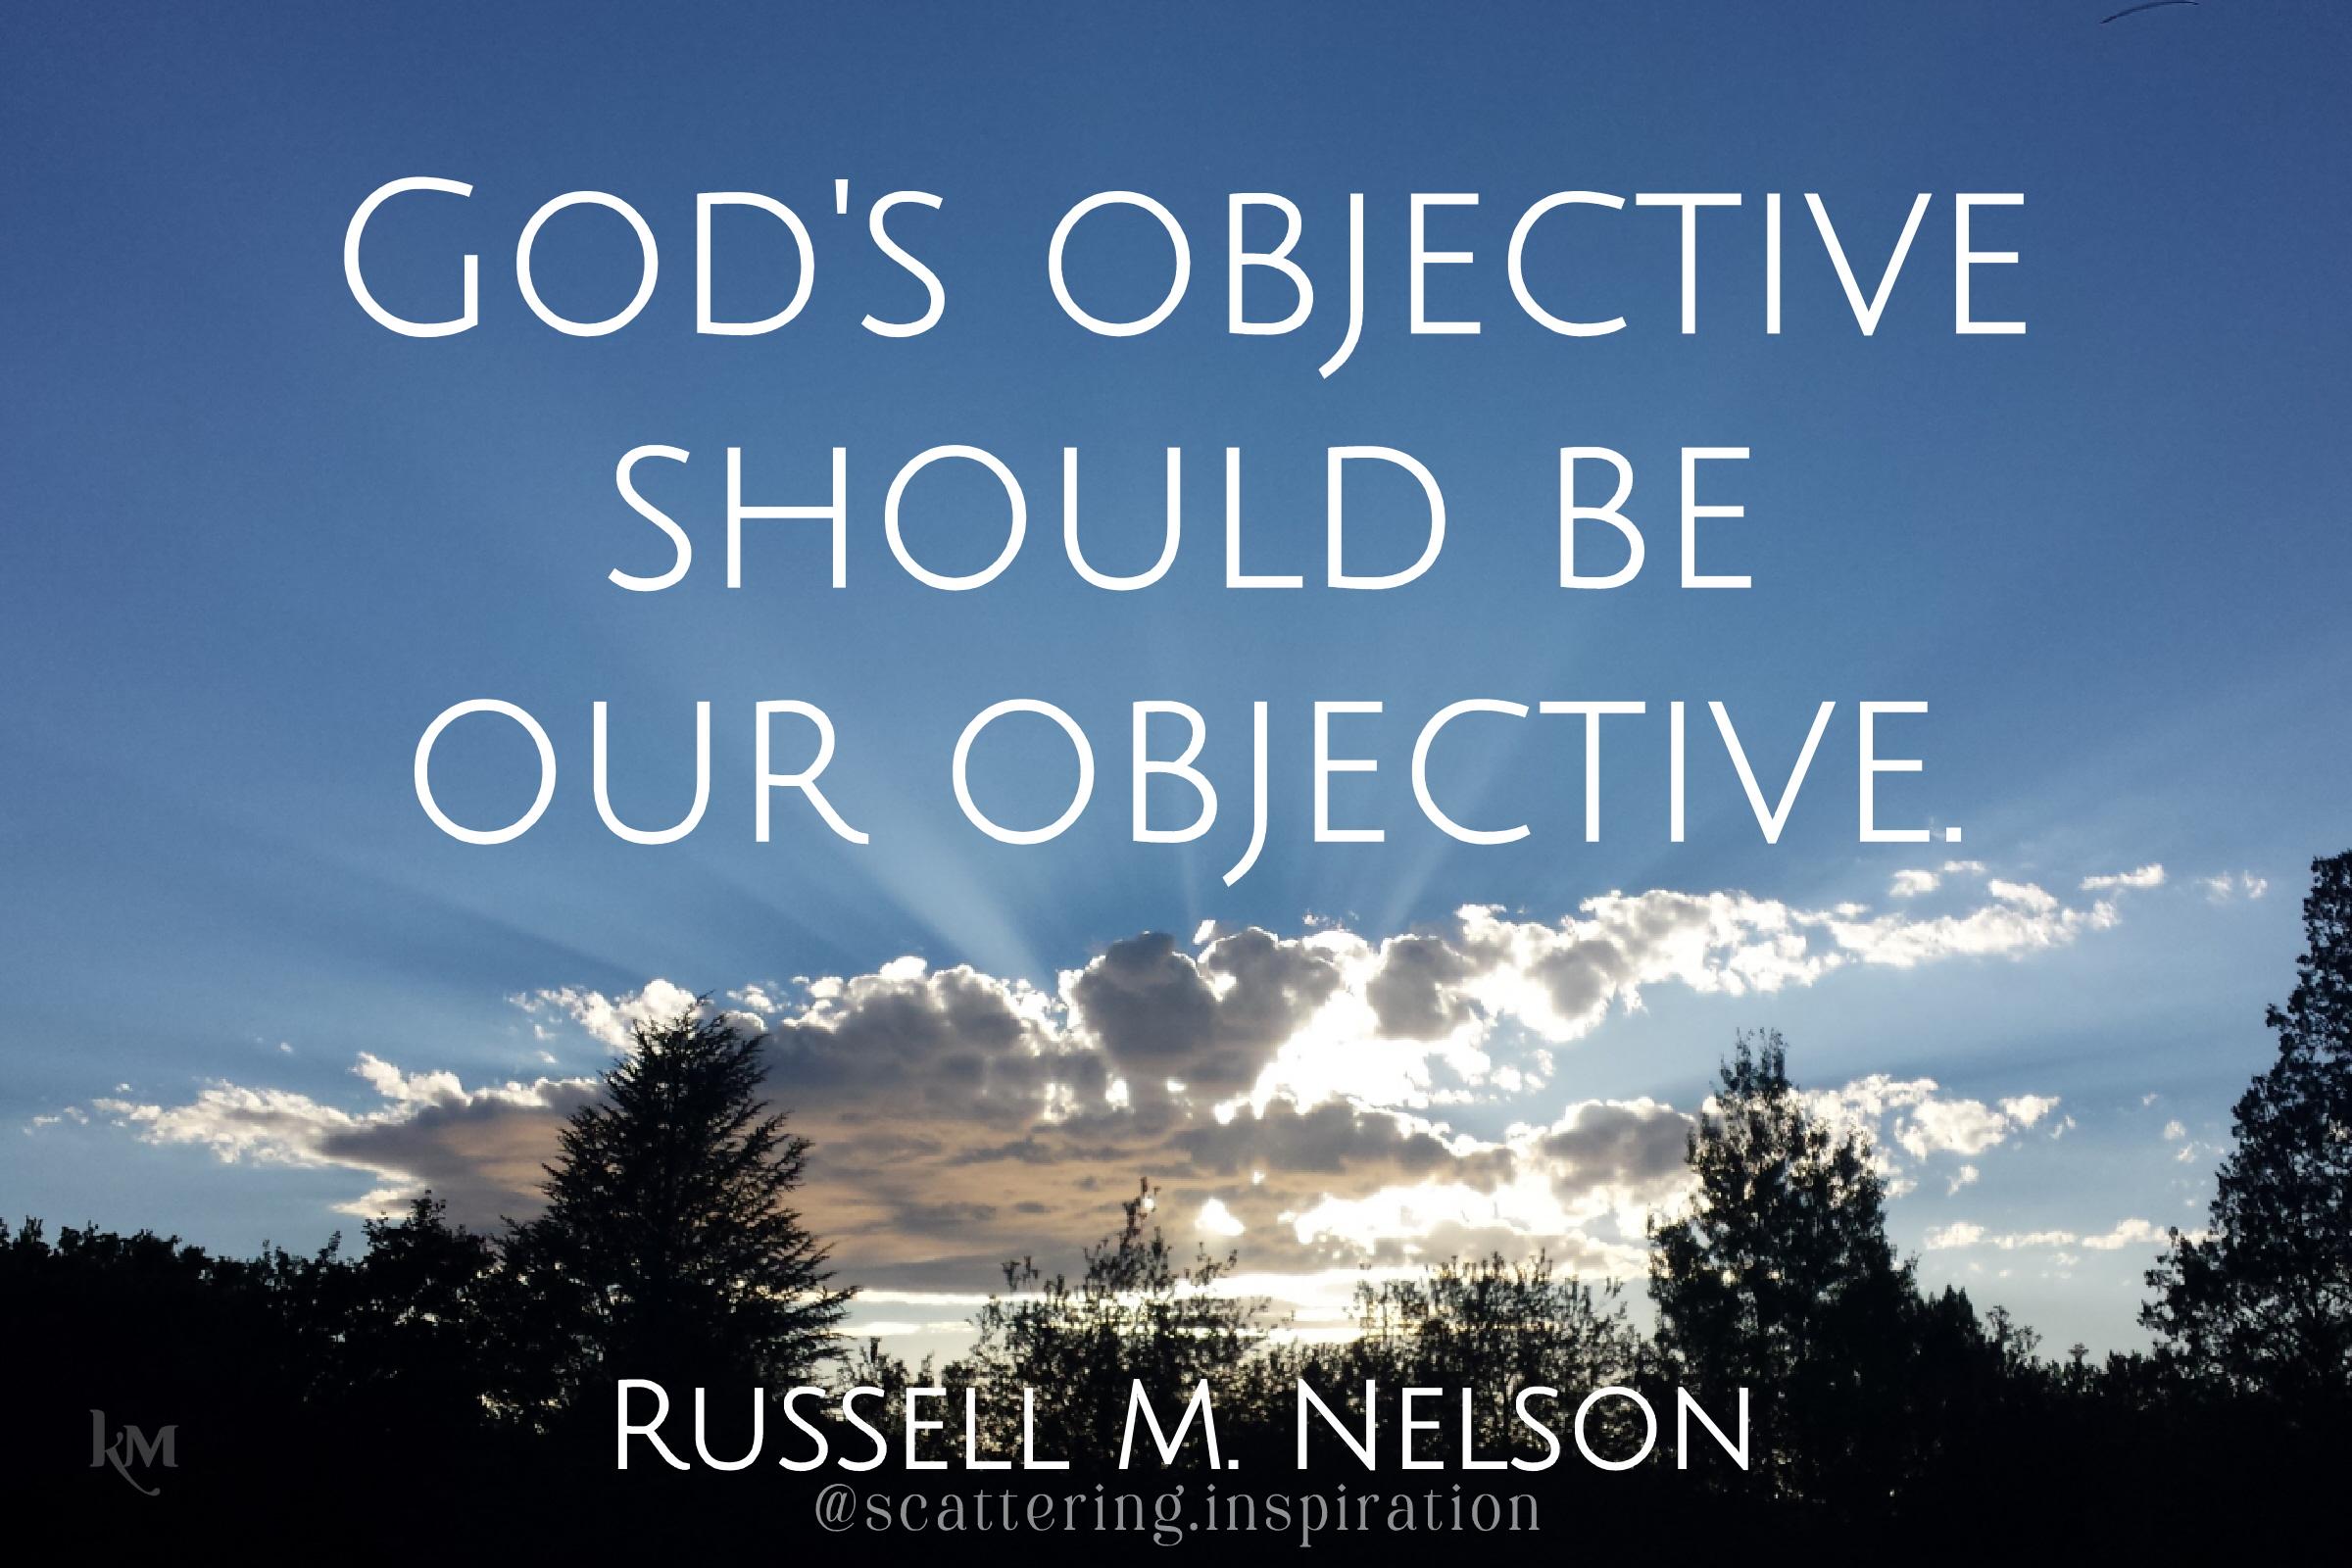 Gods objectives